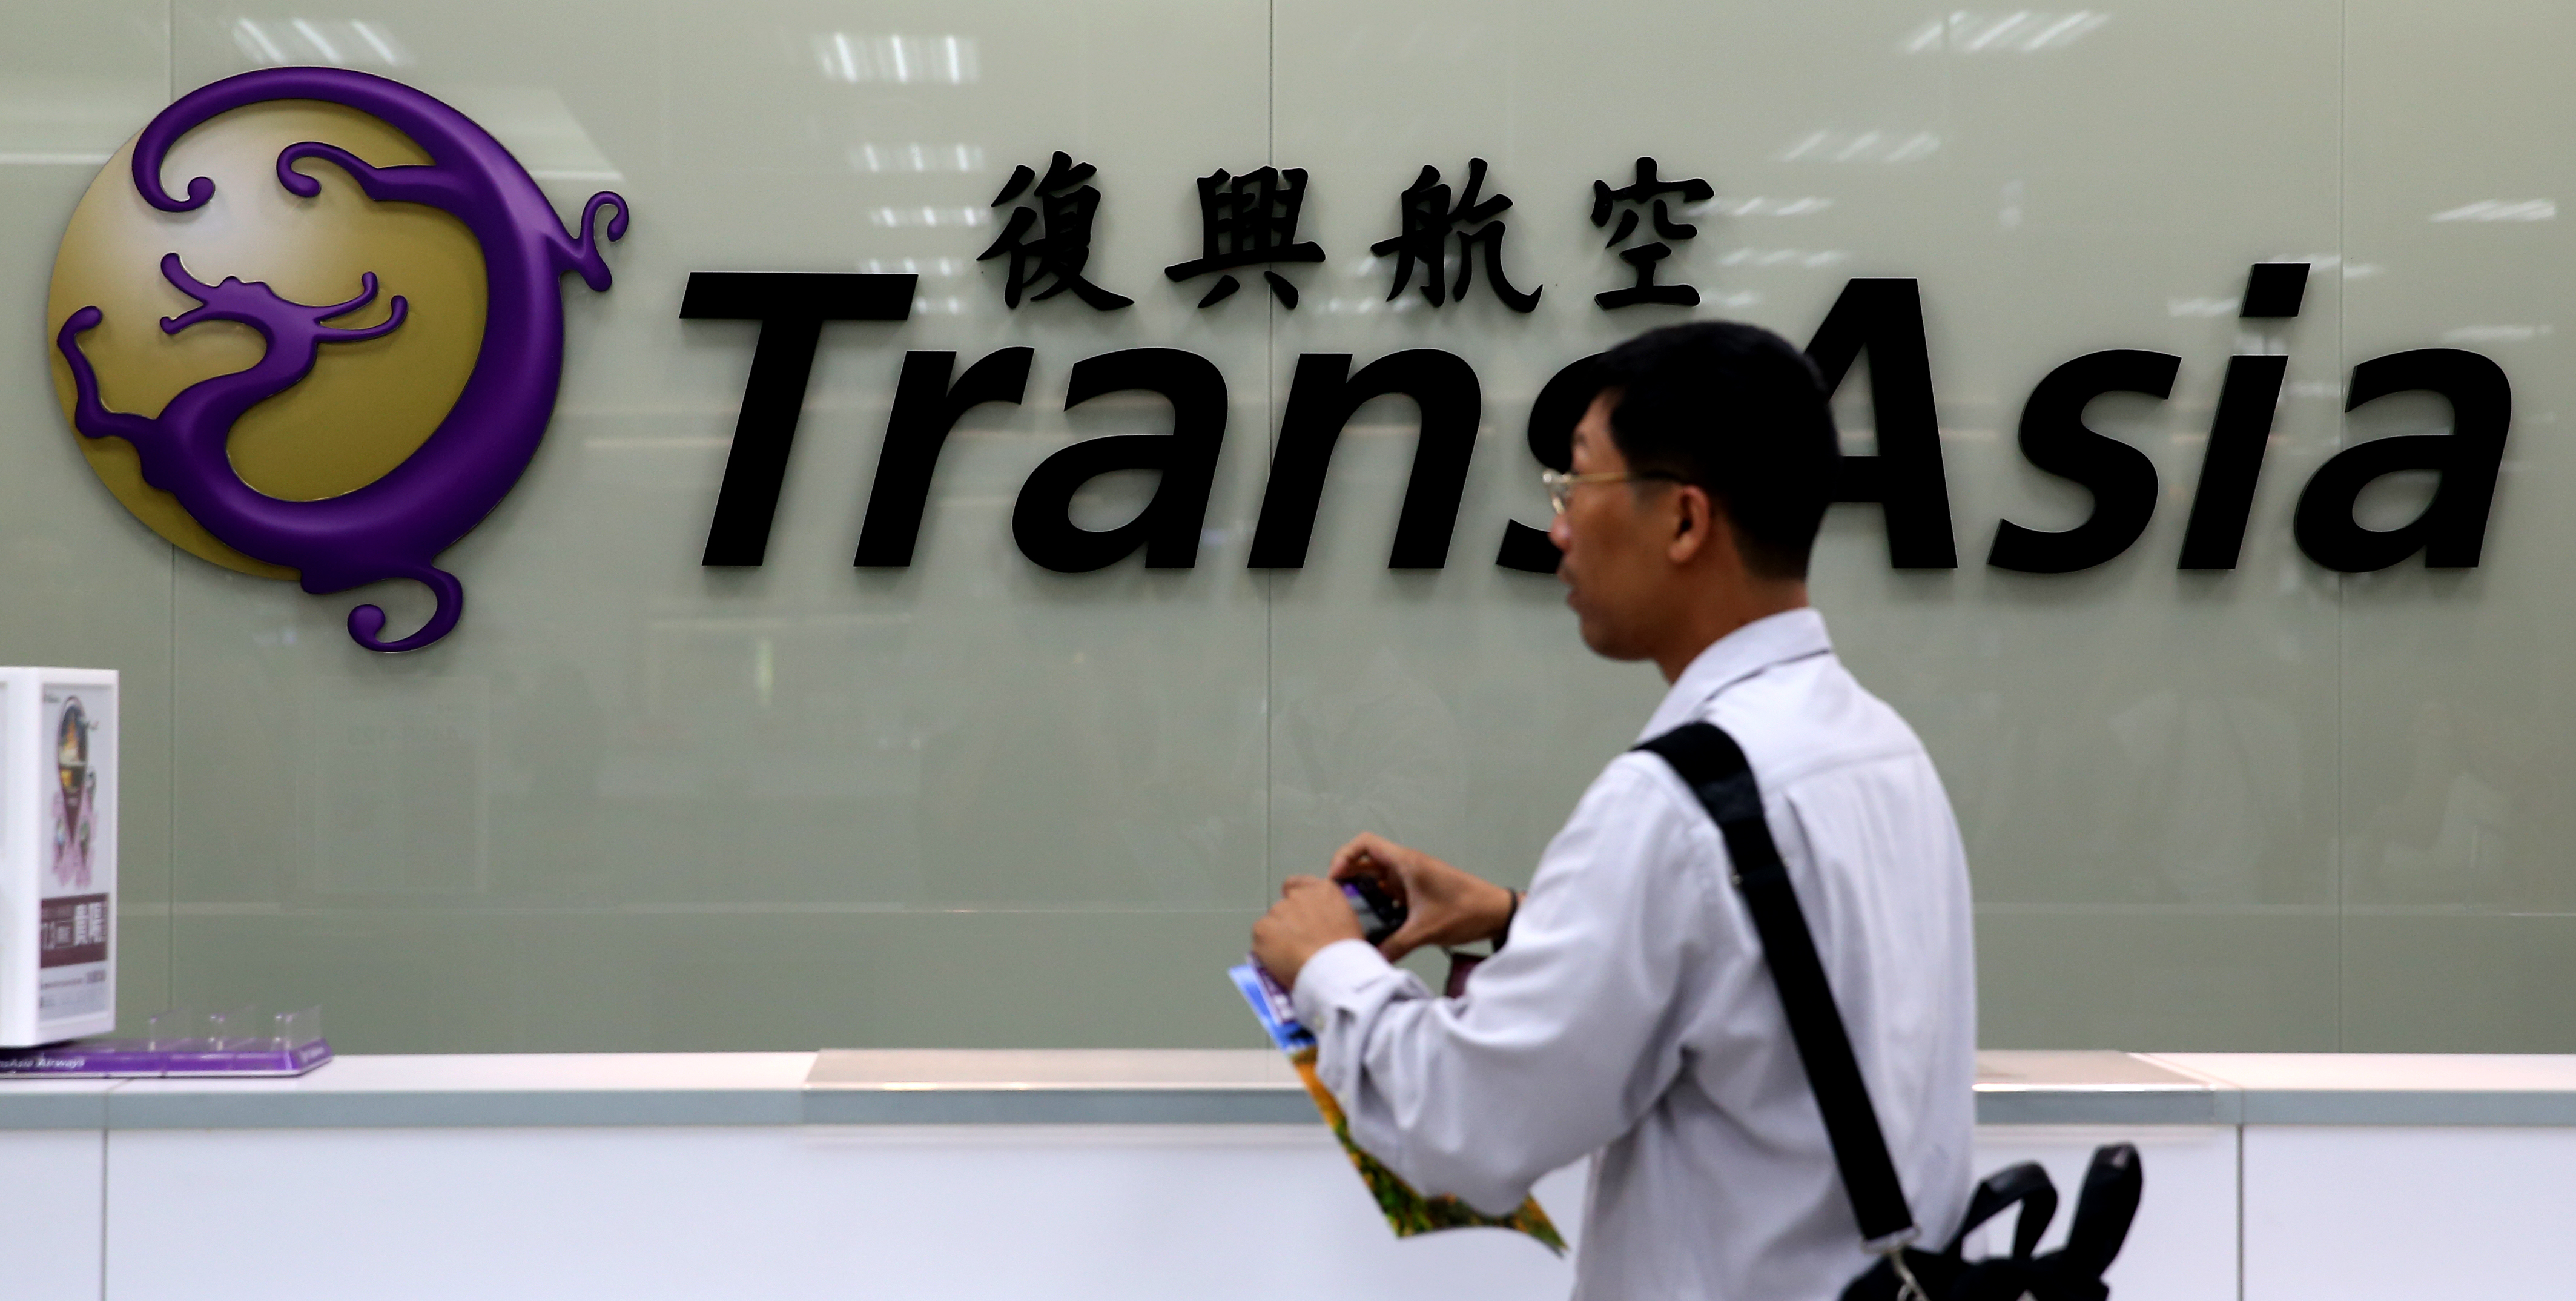 48 dead, 10 injured in Taiwan plane crash